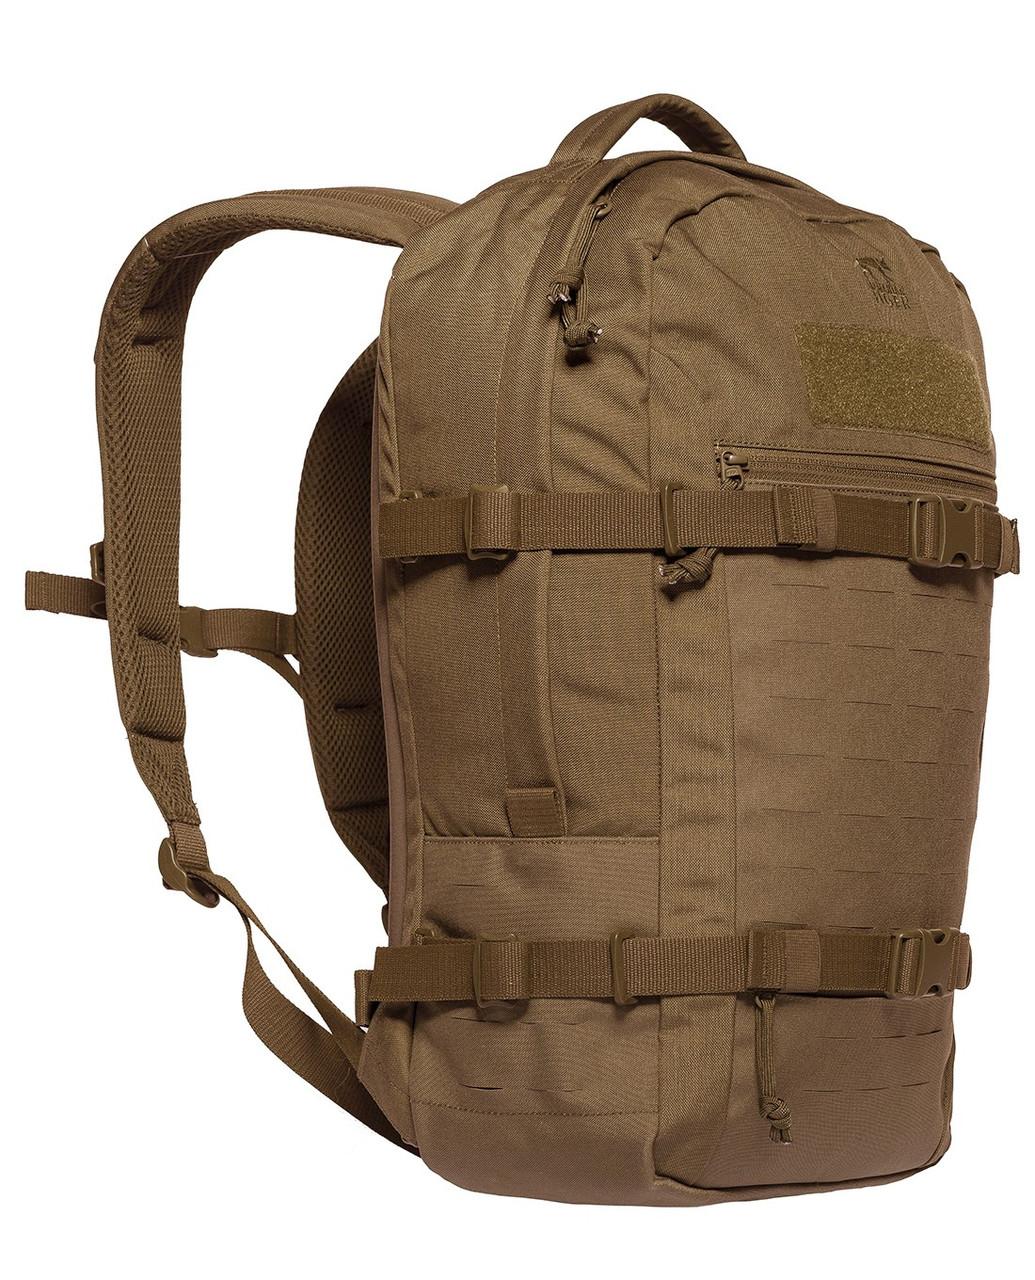 Рюкзак Tasmanian Tiger Modular Daypack XL